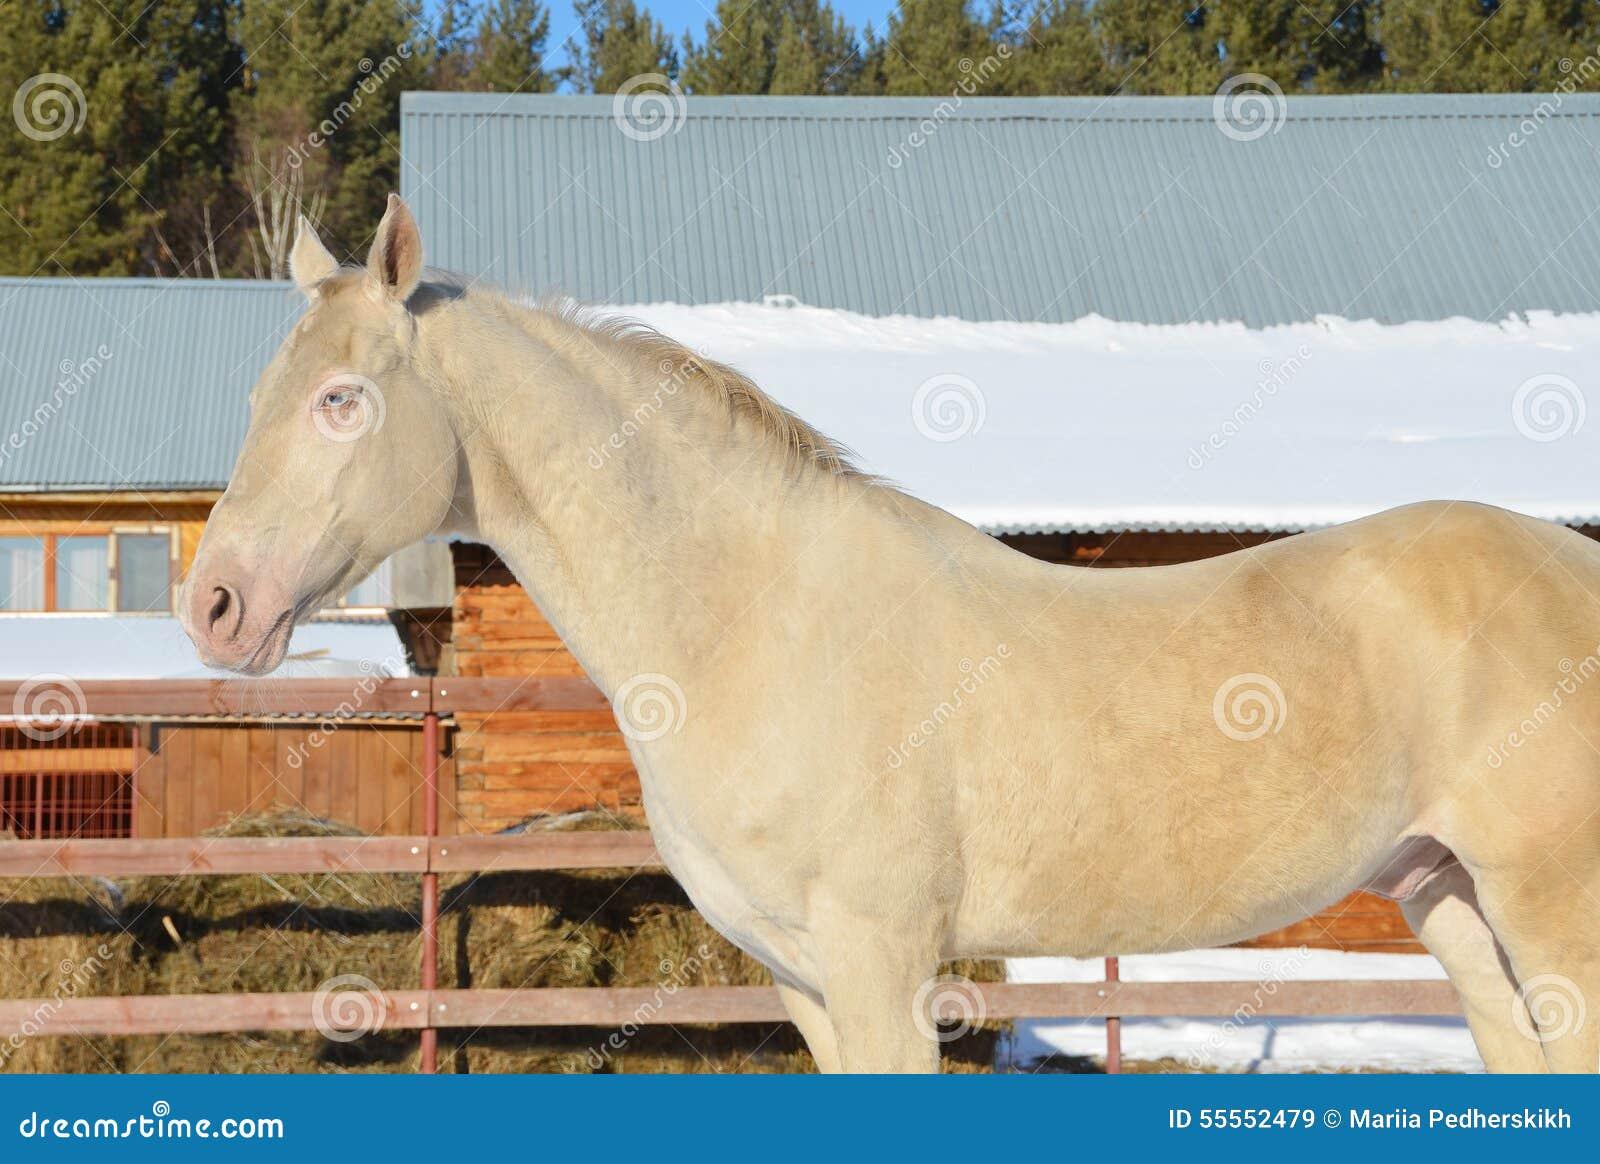 Unique Stallion at Walk